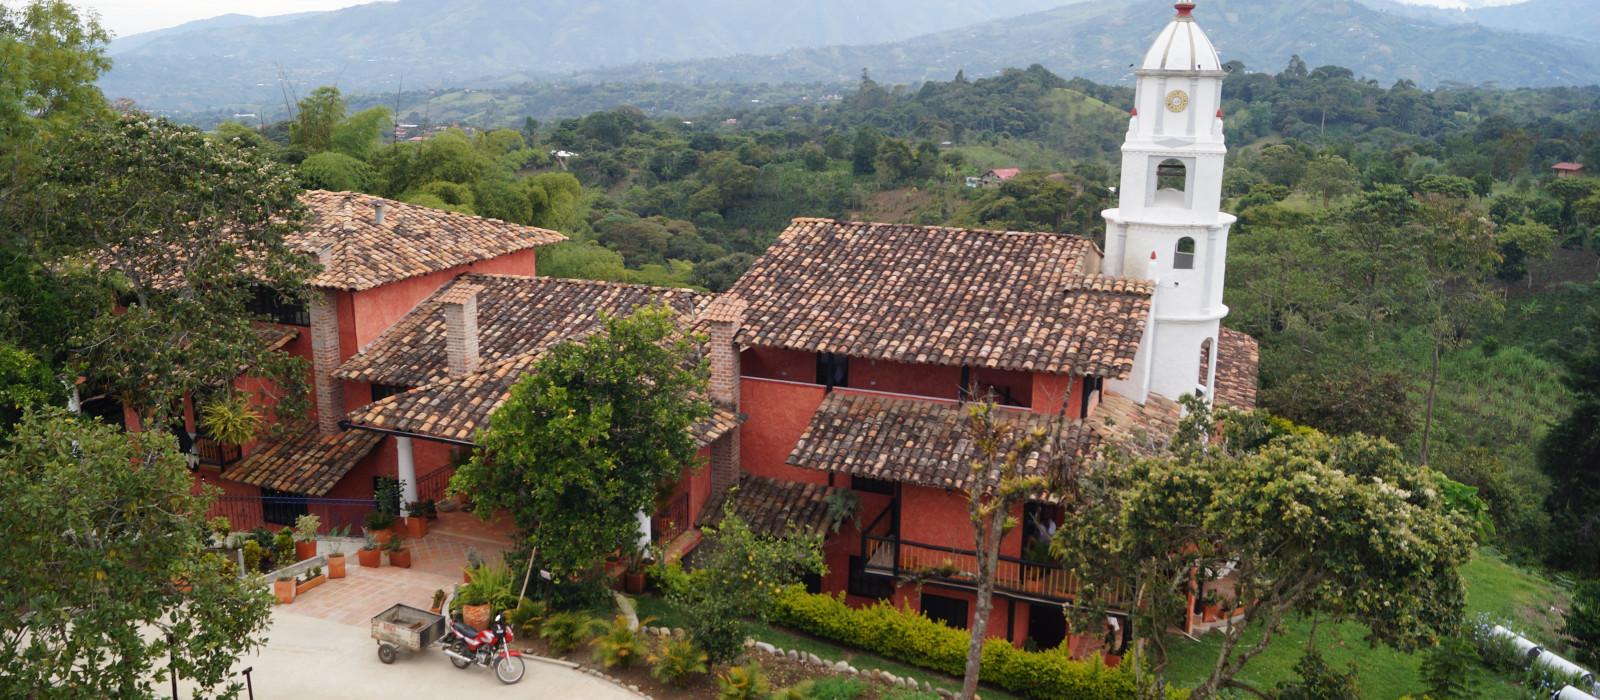 Hotel Monasterio San Agustin Kolumbien